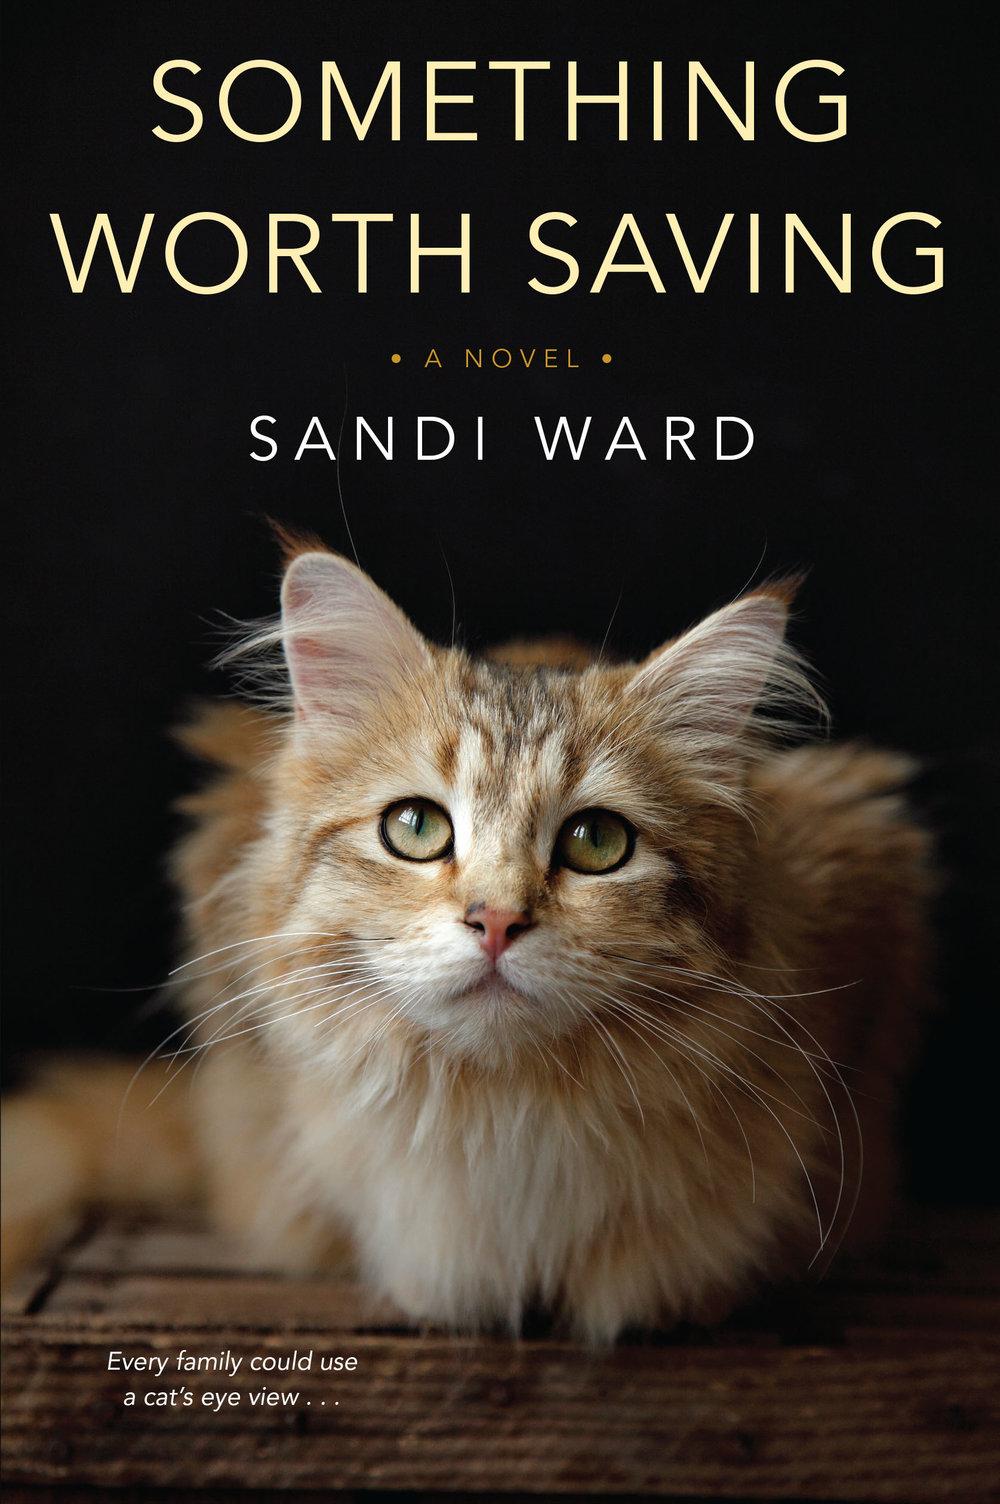 sandi ward something worth saving